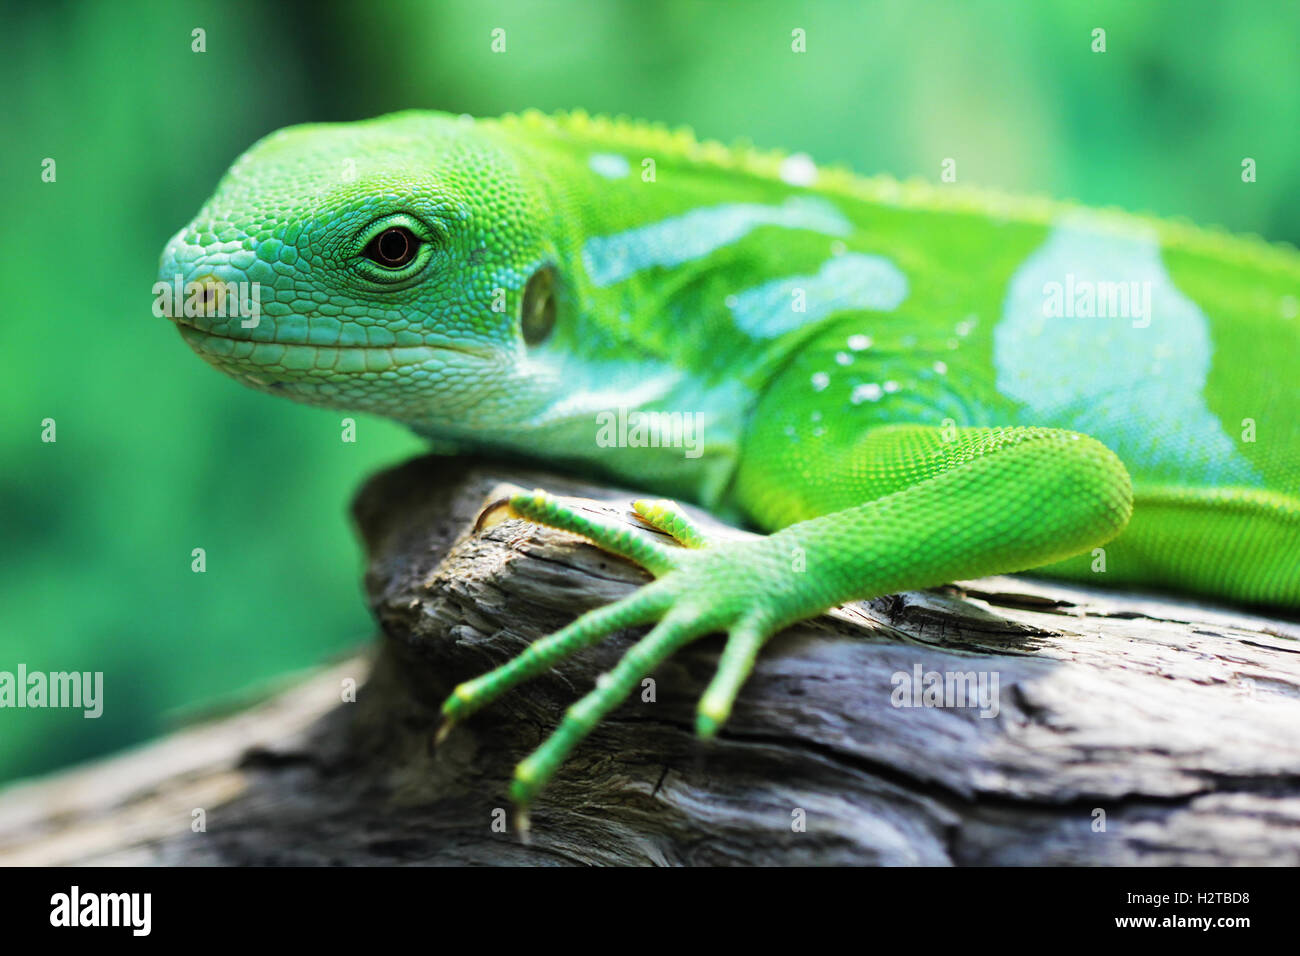 Eidechse Nahaufnahme Makro Tier Portrait-Foto Stockbild